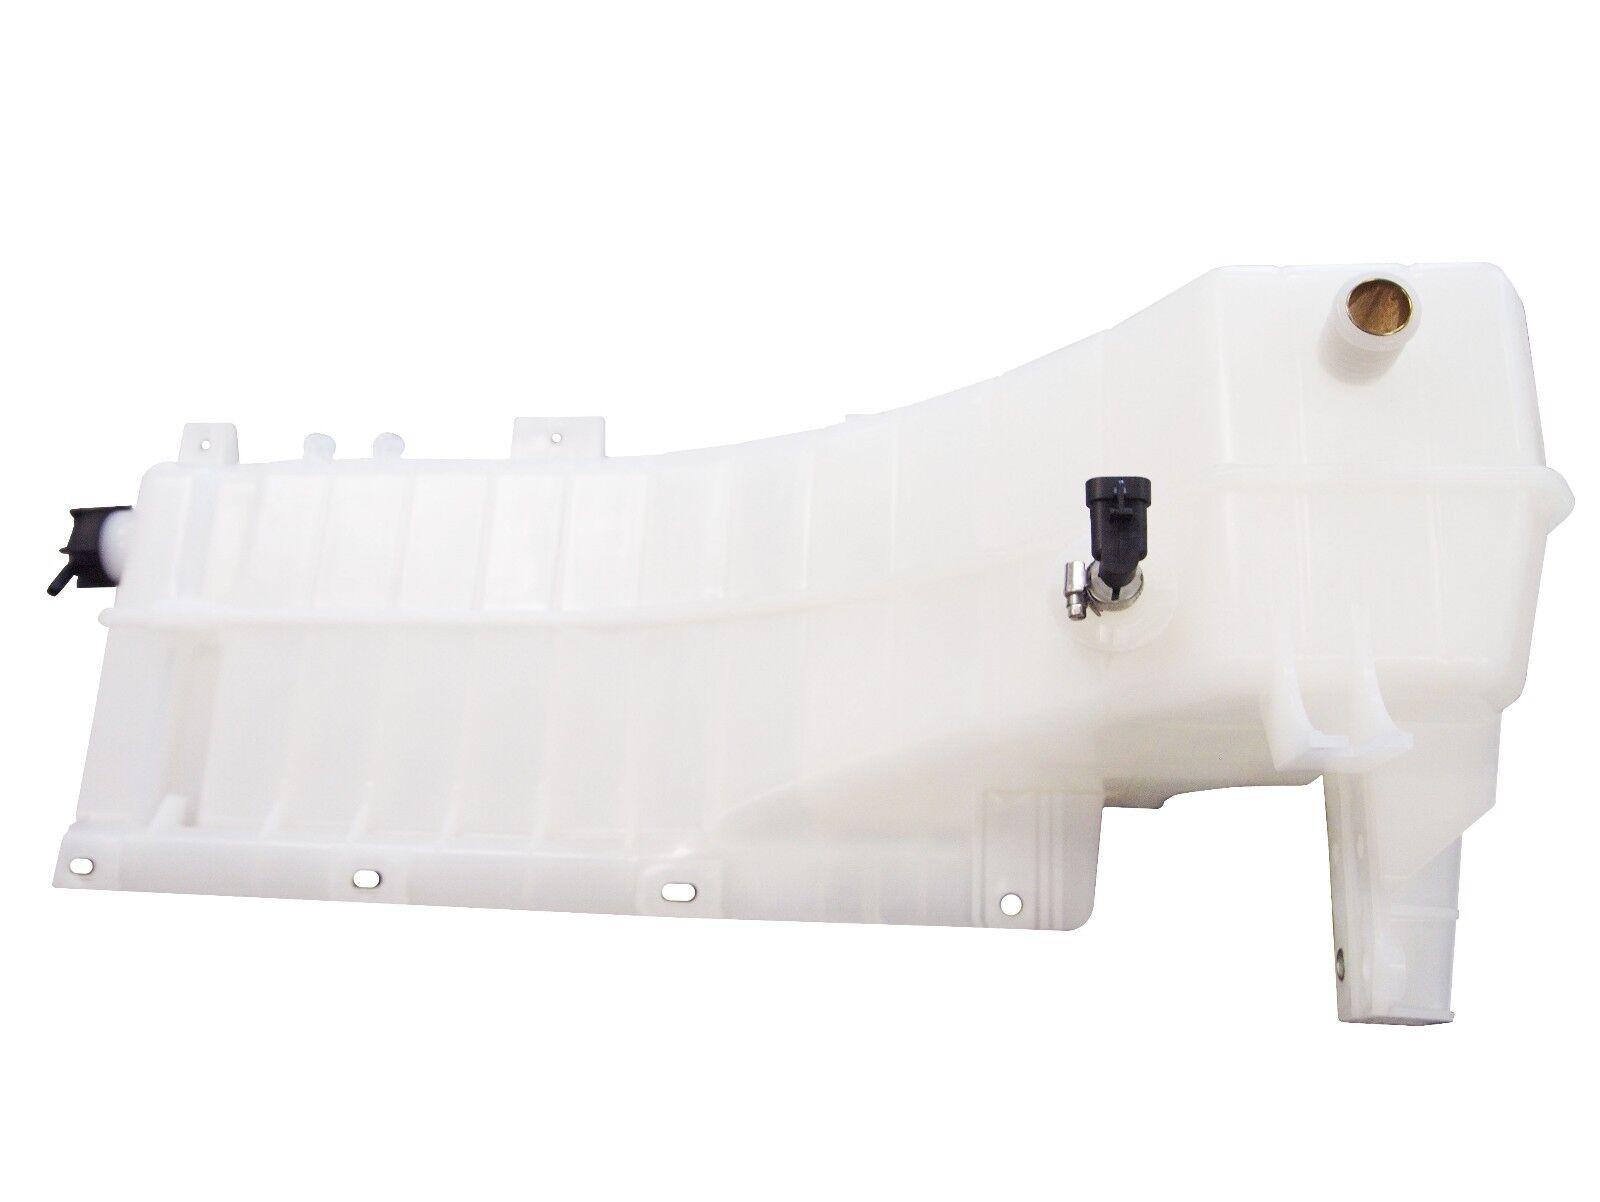 Volvo VNL Coolant Reservoir 20968795 21000194 21038101 21067134 22564837